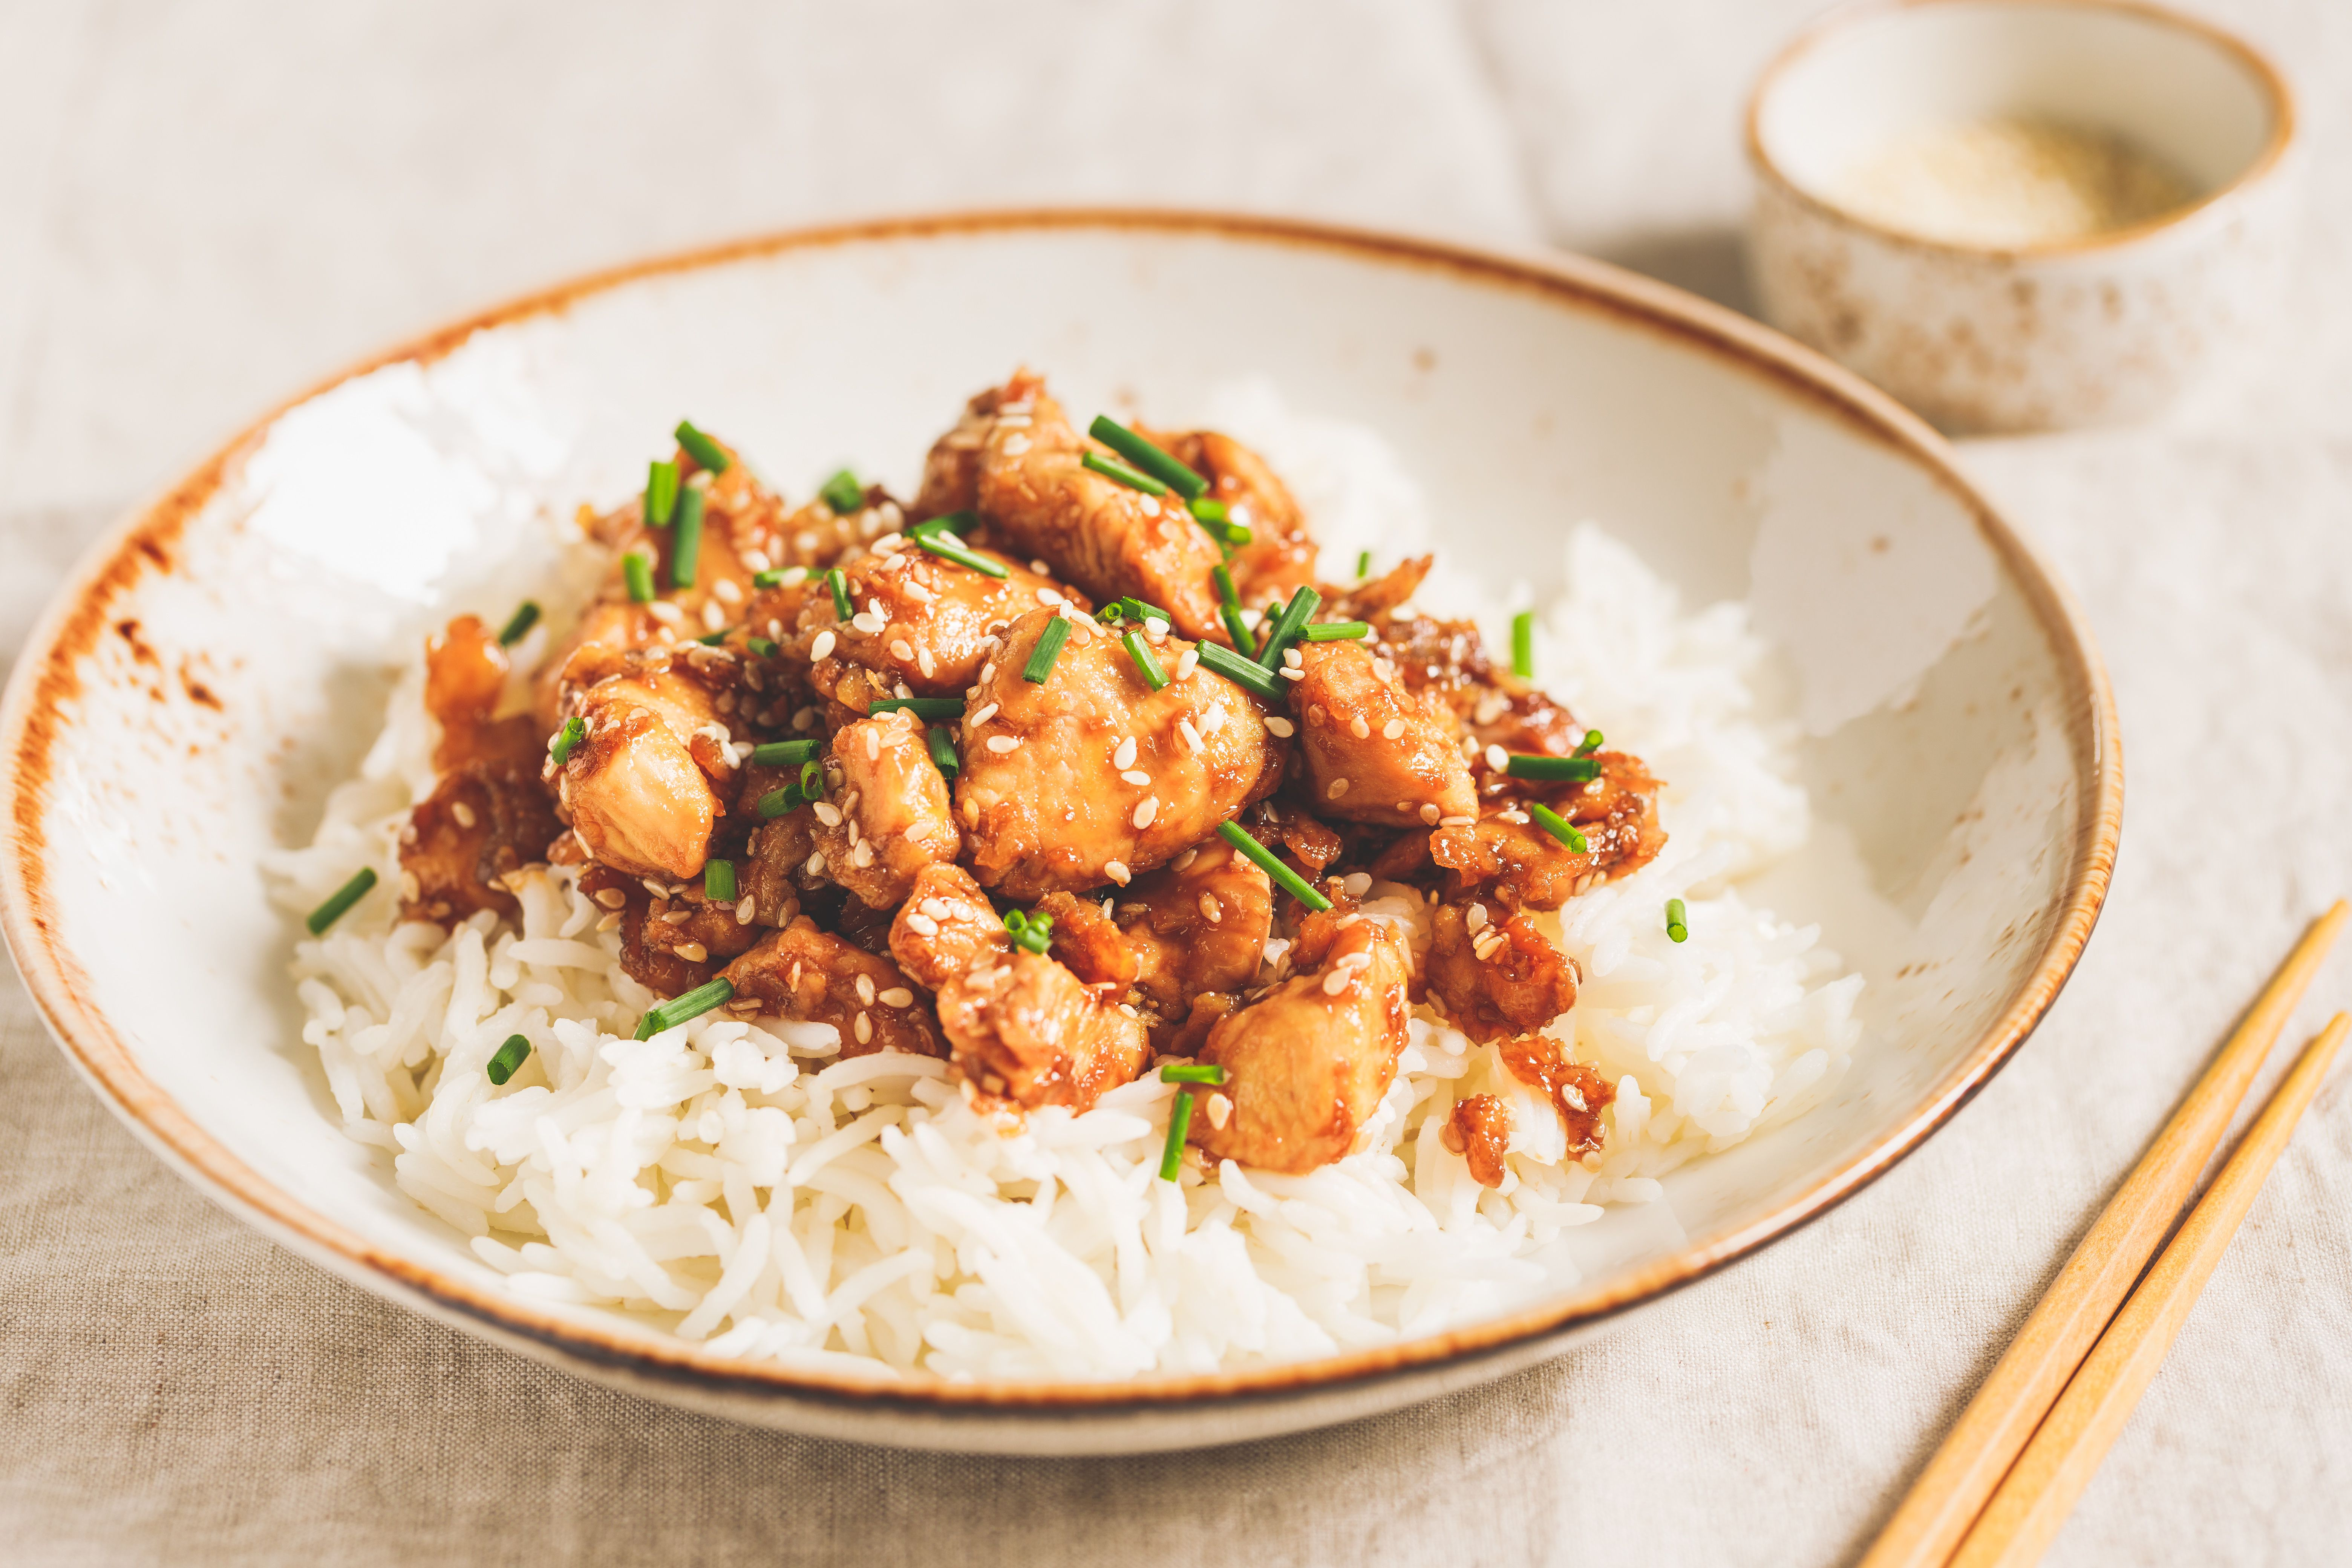 Serve over rice